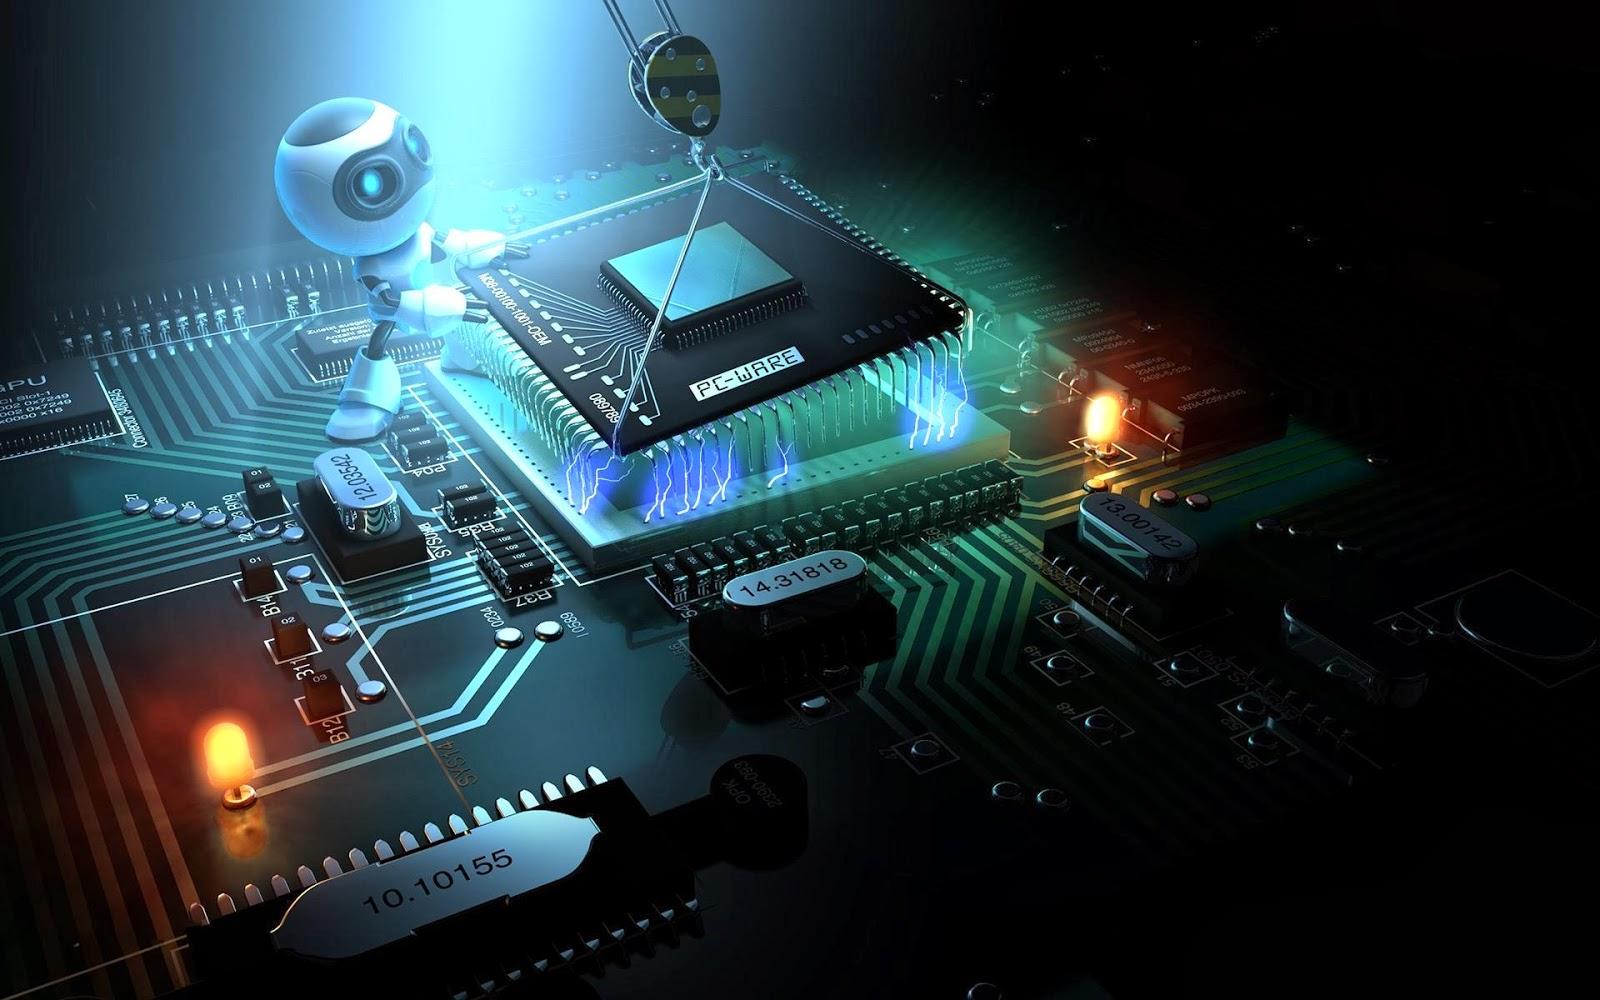 بالصور معلومات عن الهاردوير Hardware واهم اجزائه 4b4c0ab18c0d1caff4b624f23ca233b5